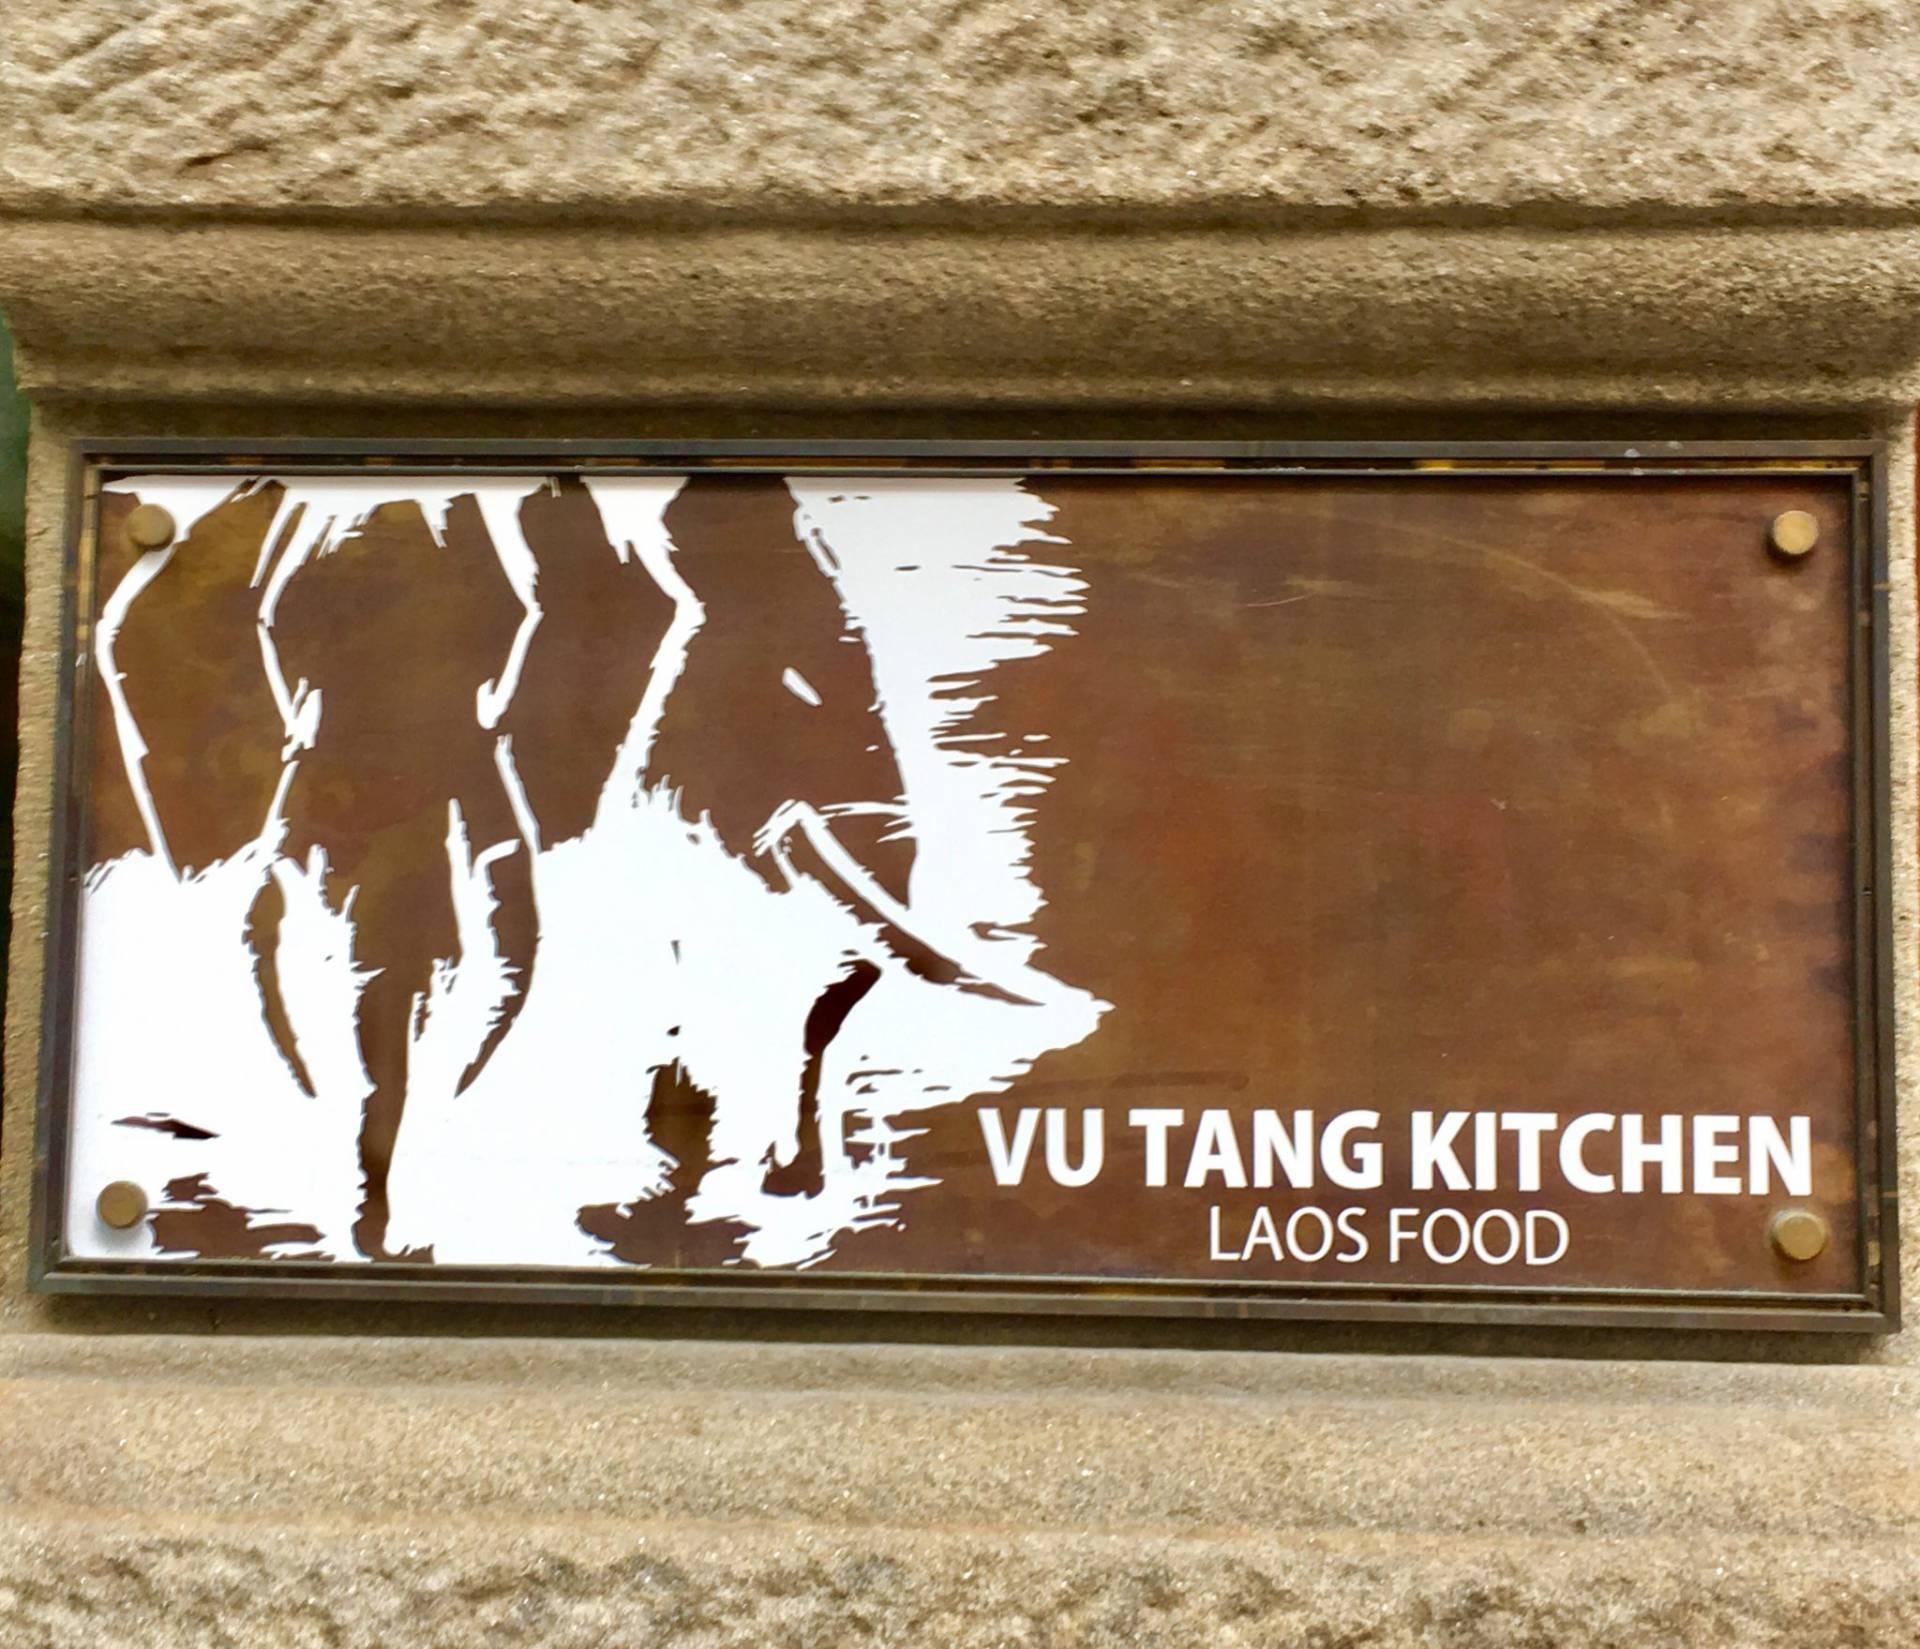 VU TANG KITCHEN, MUENCHEN